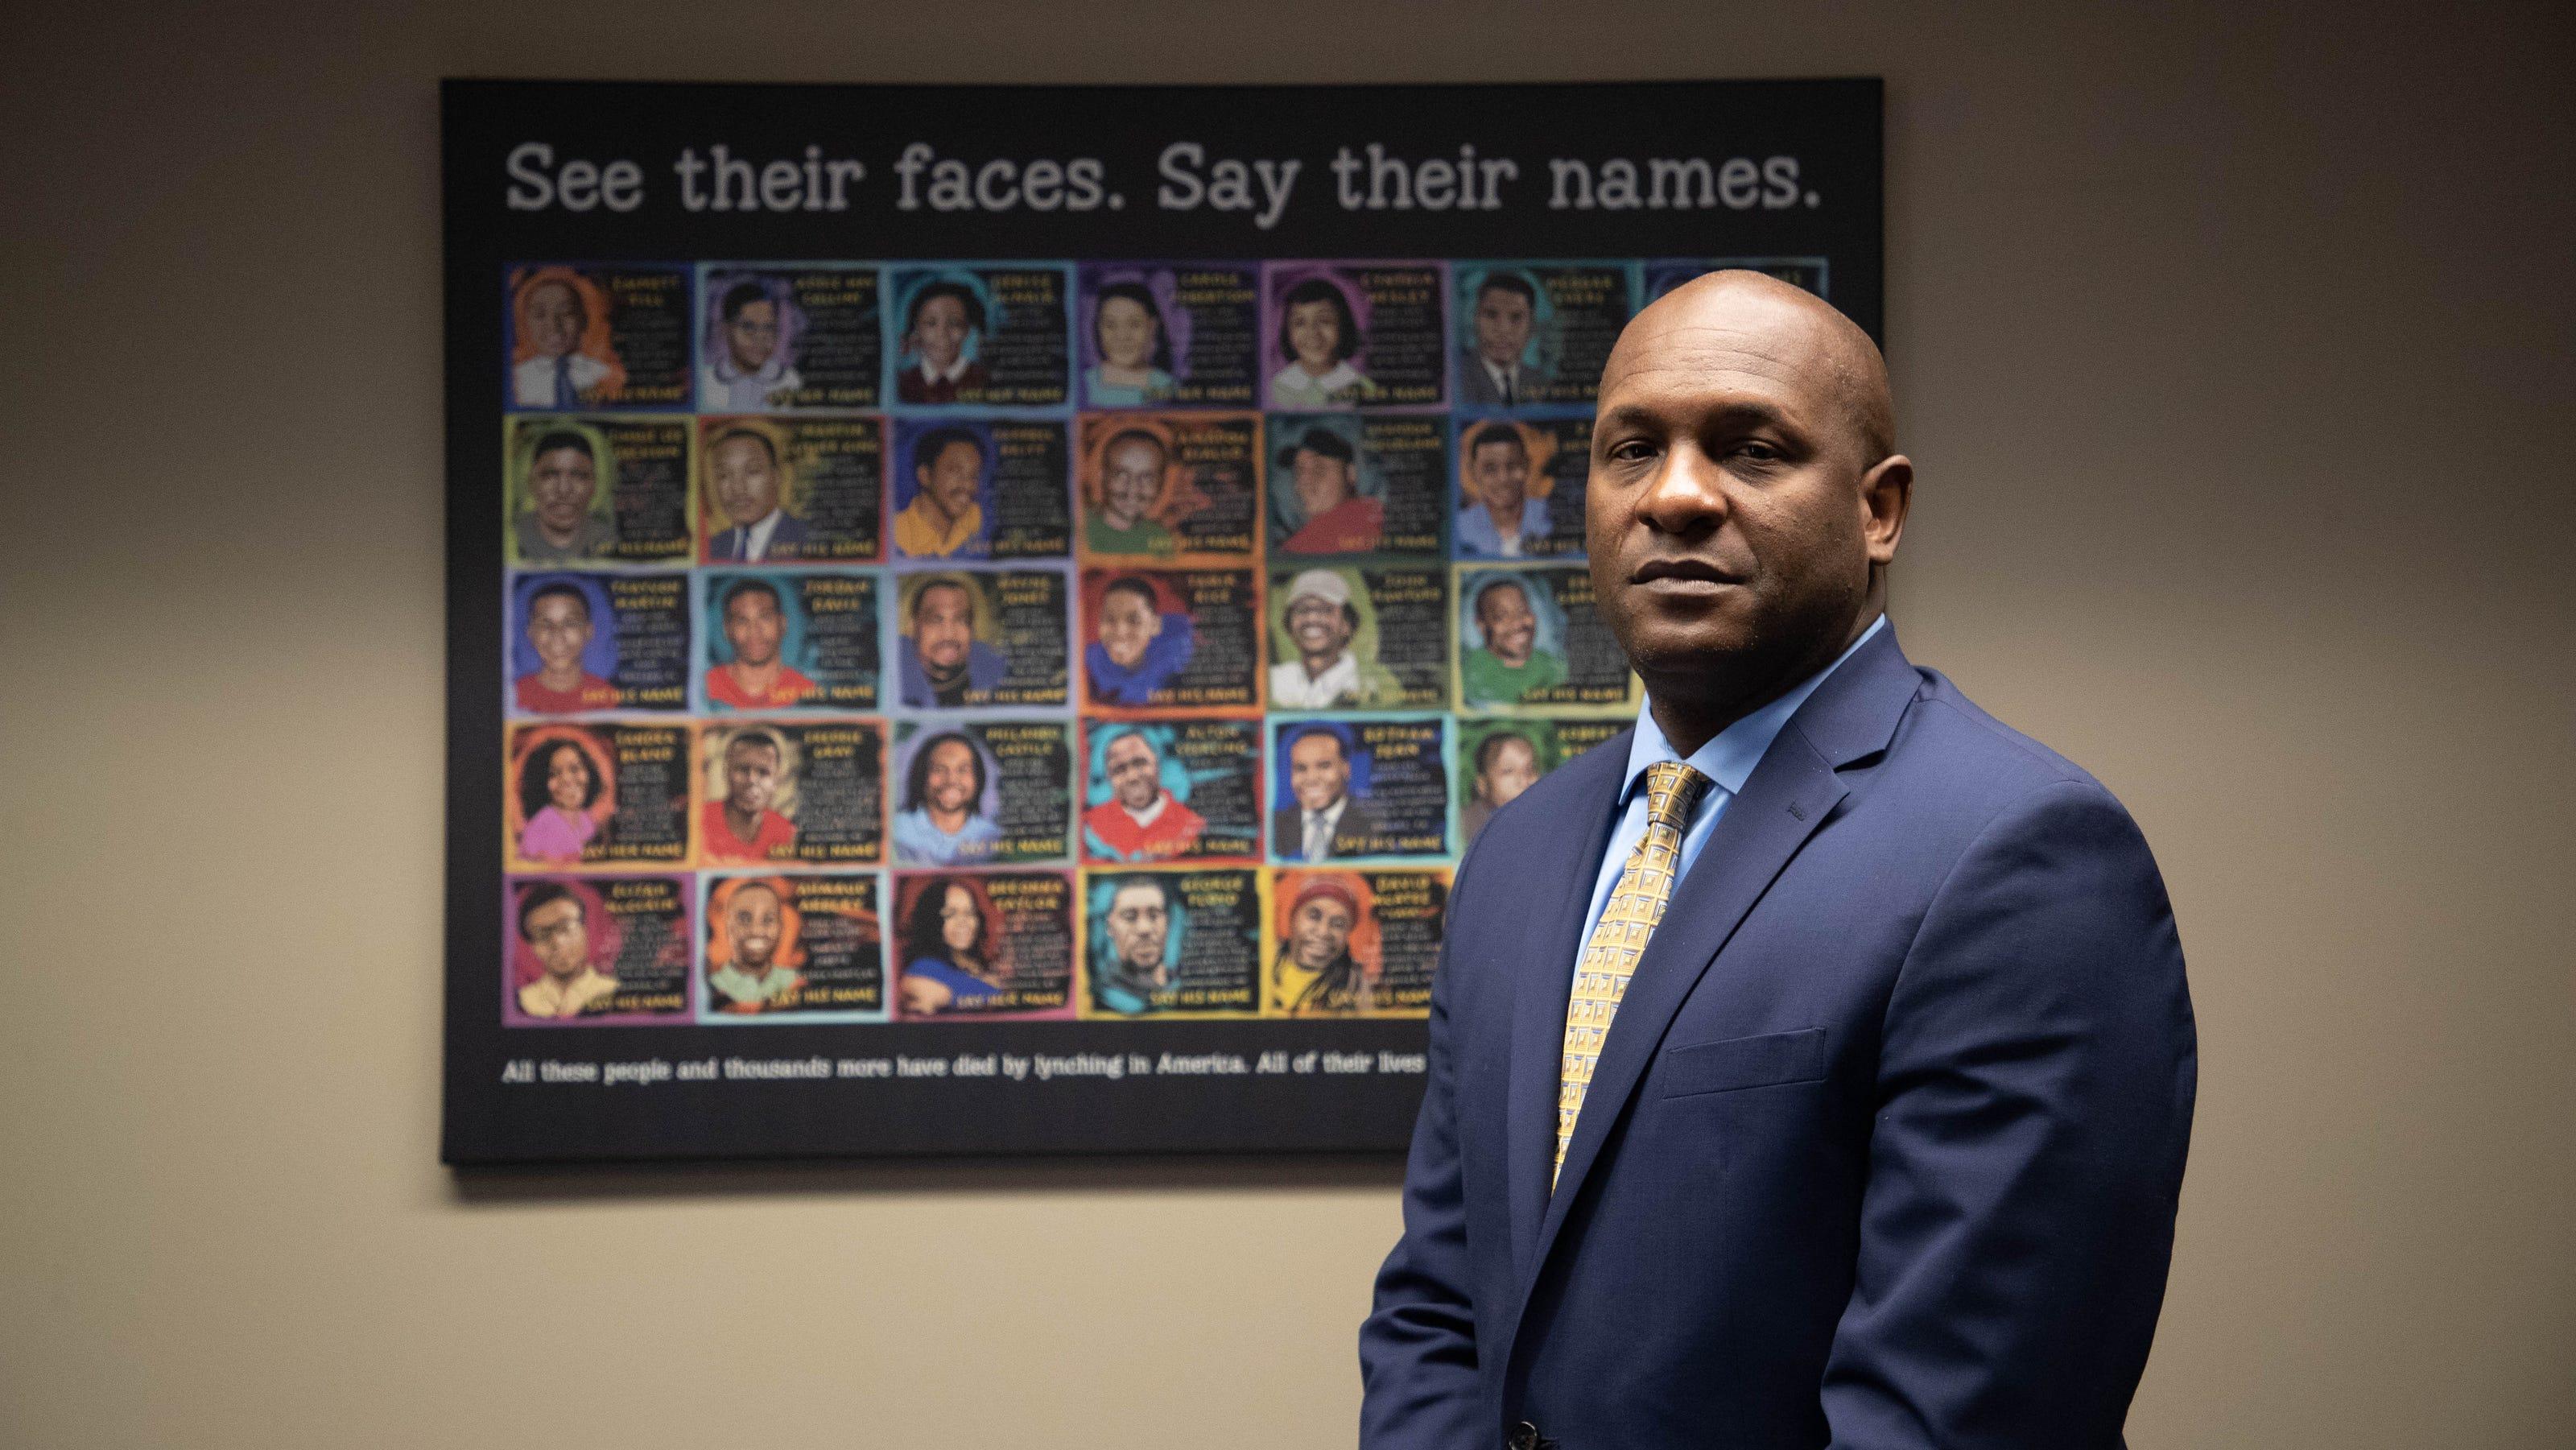 Art of George Floyd, other Black people killed, at Florida ...